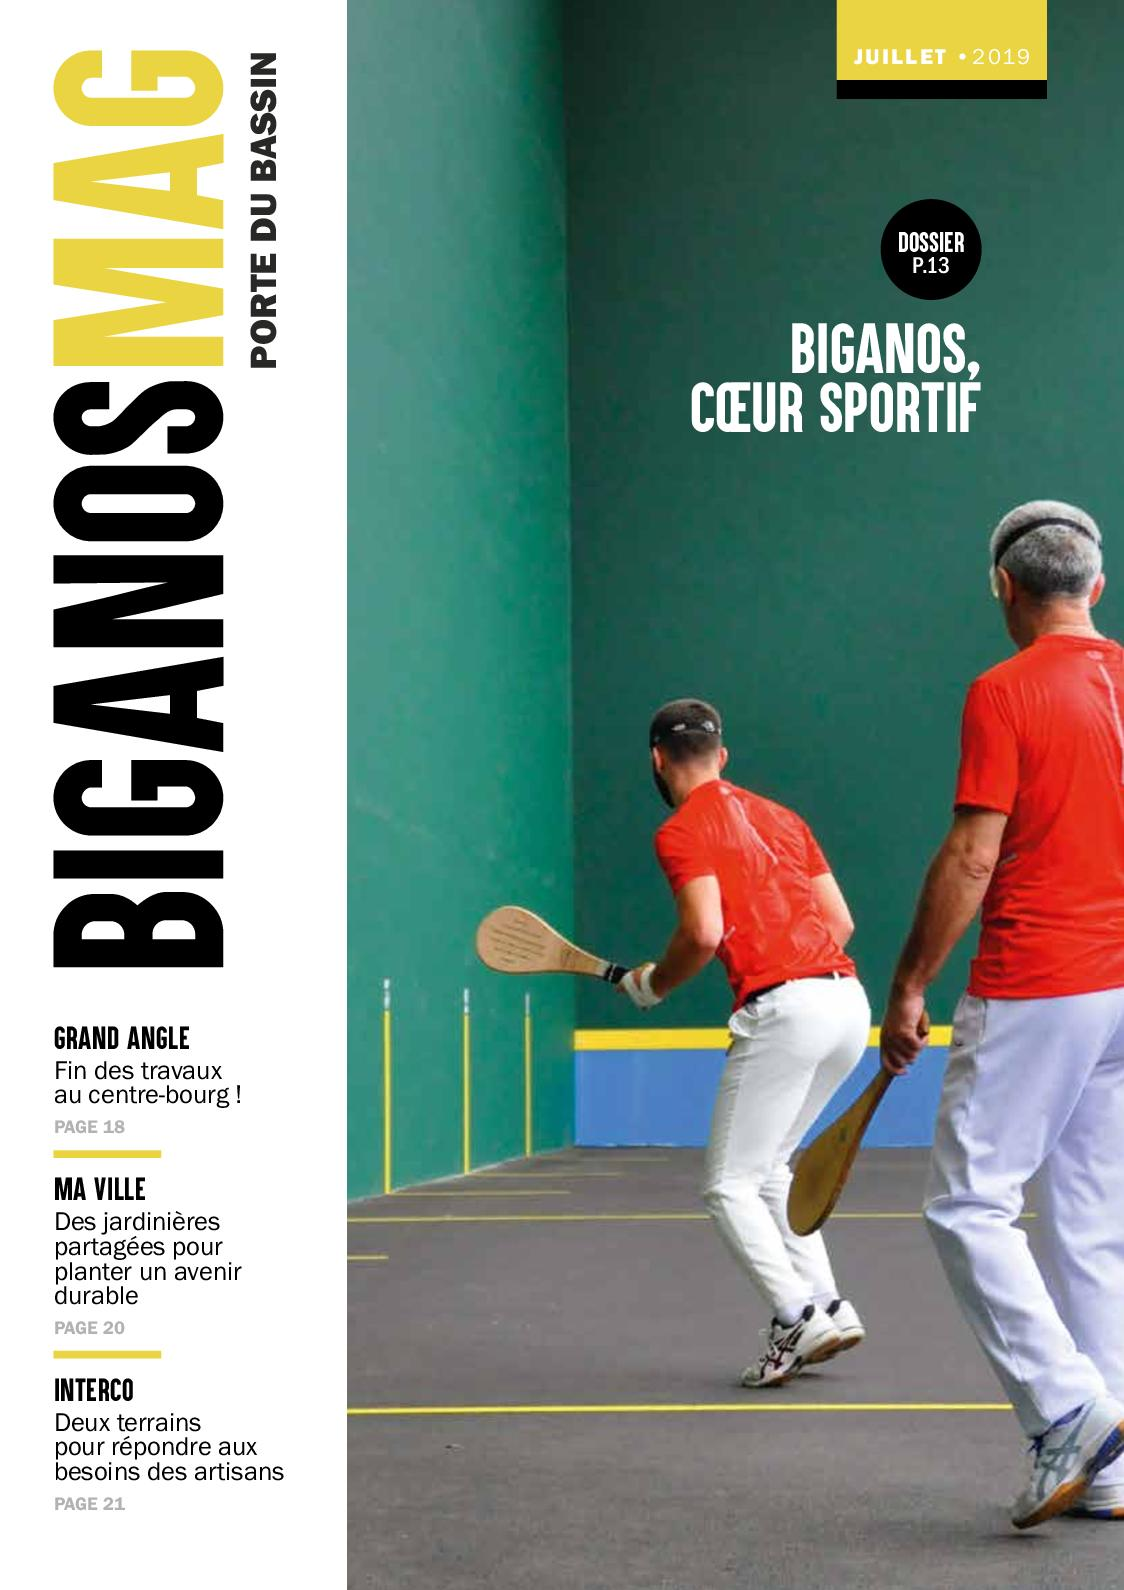 Calaméo Biganos Magazine Juillet 2019